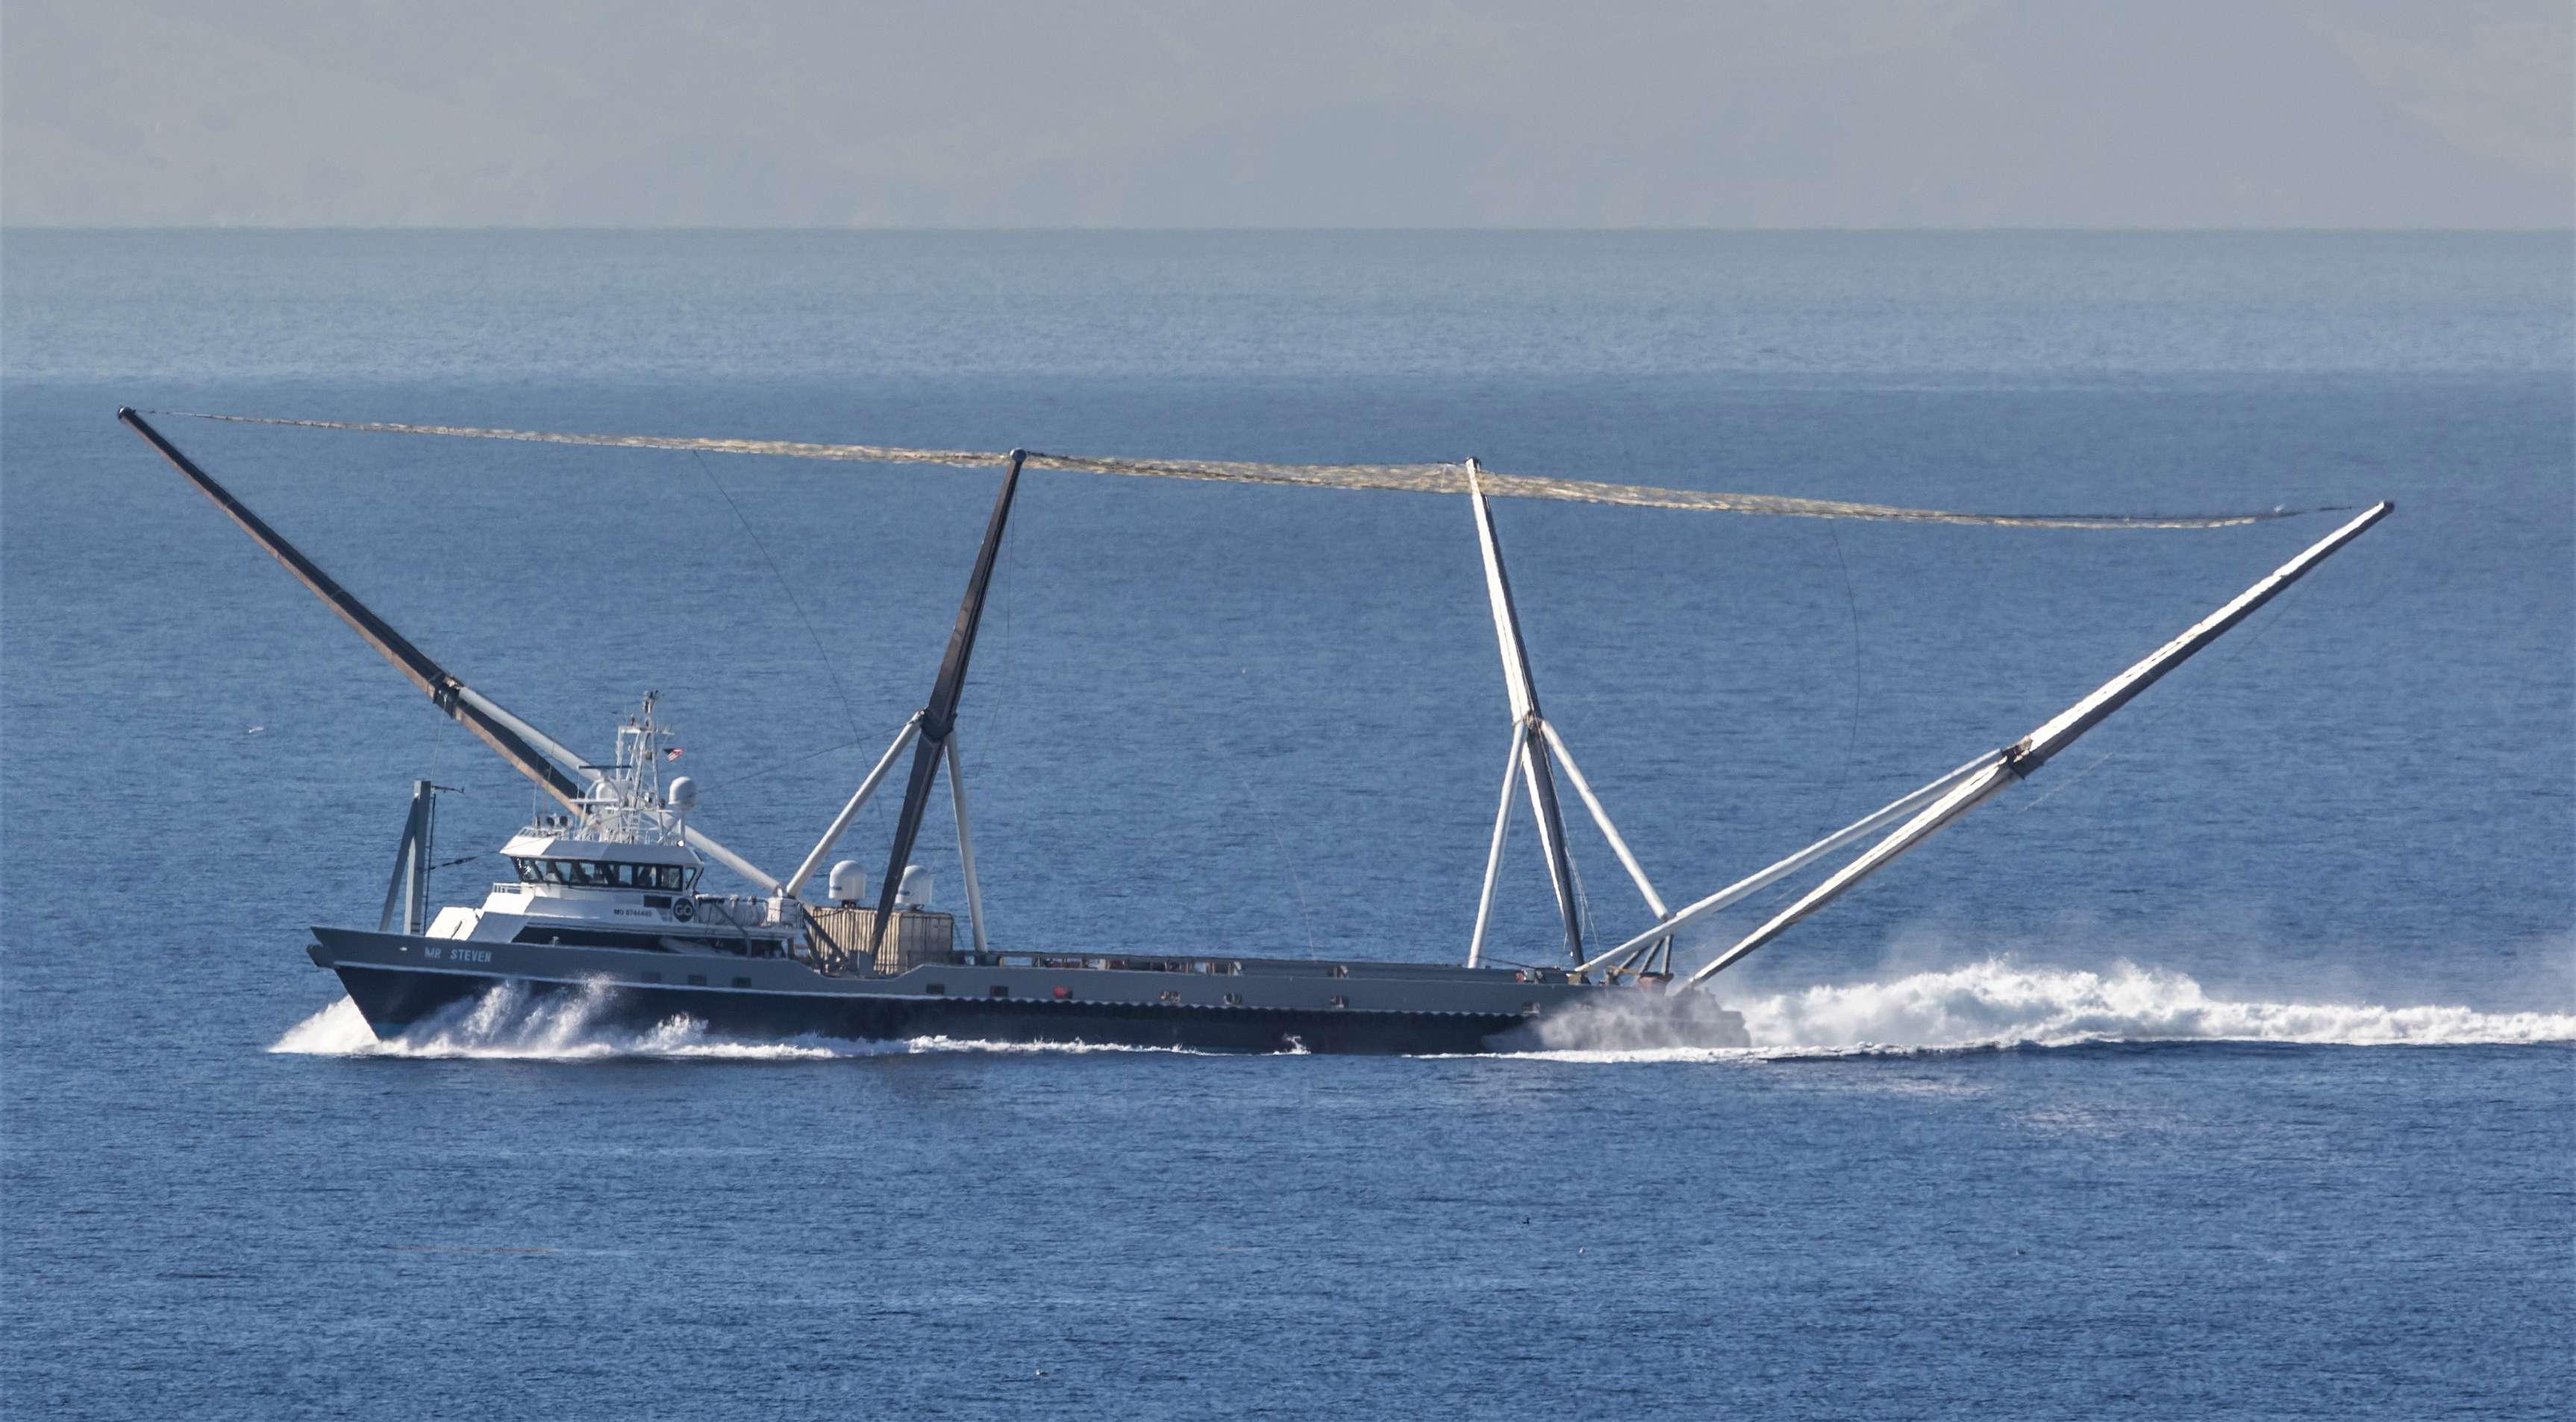 Mr Steven sea trials 111218 (Pauline Acalin) 3(c)